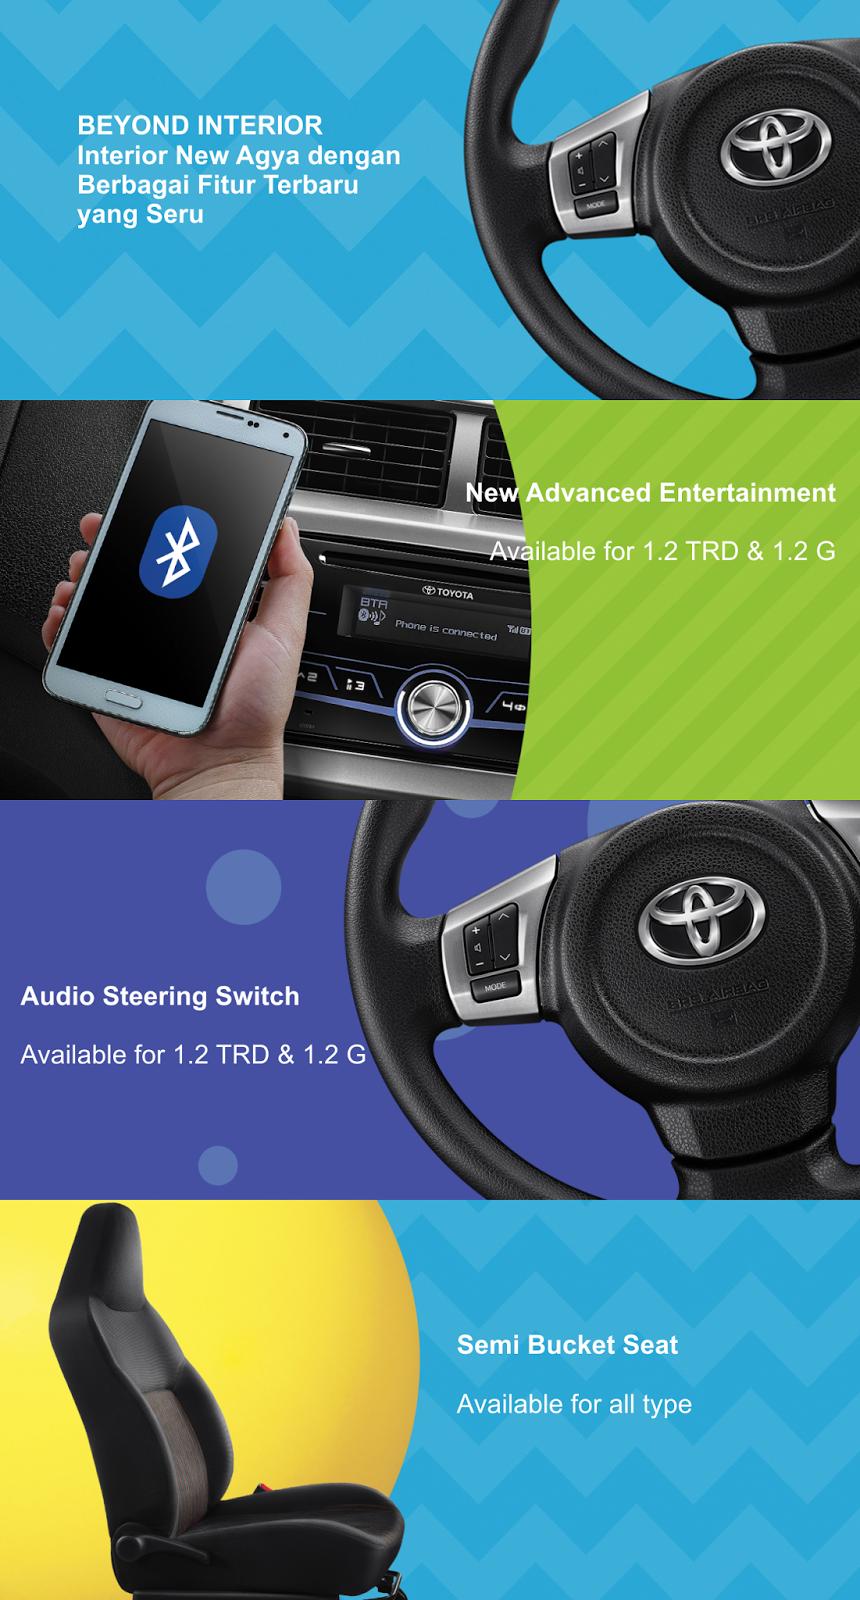 interior-mobil-new-agya